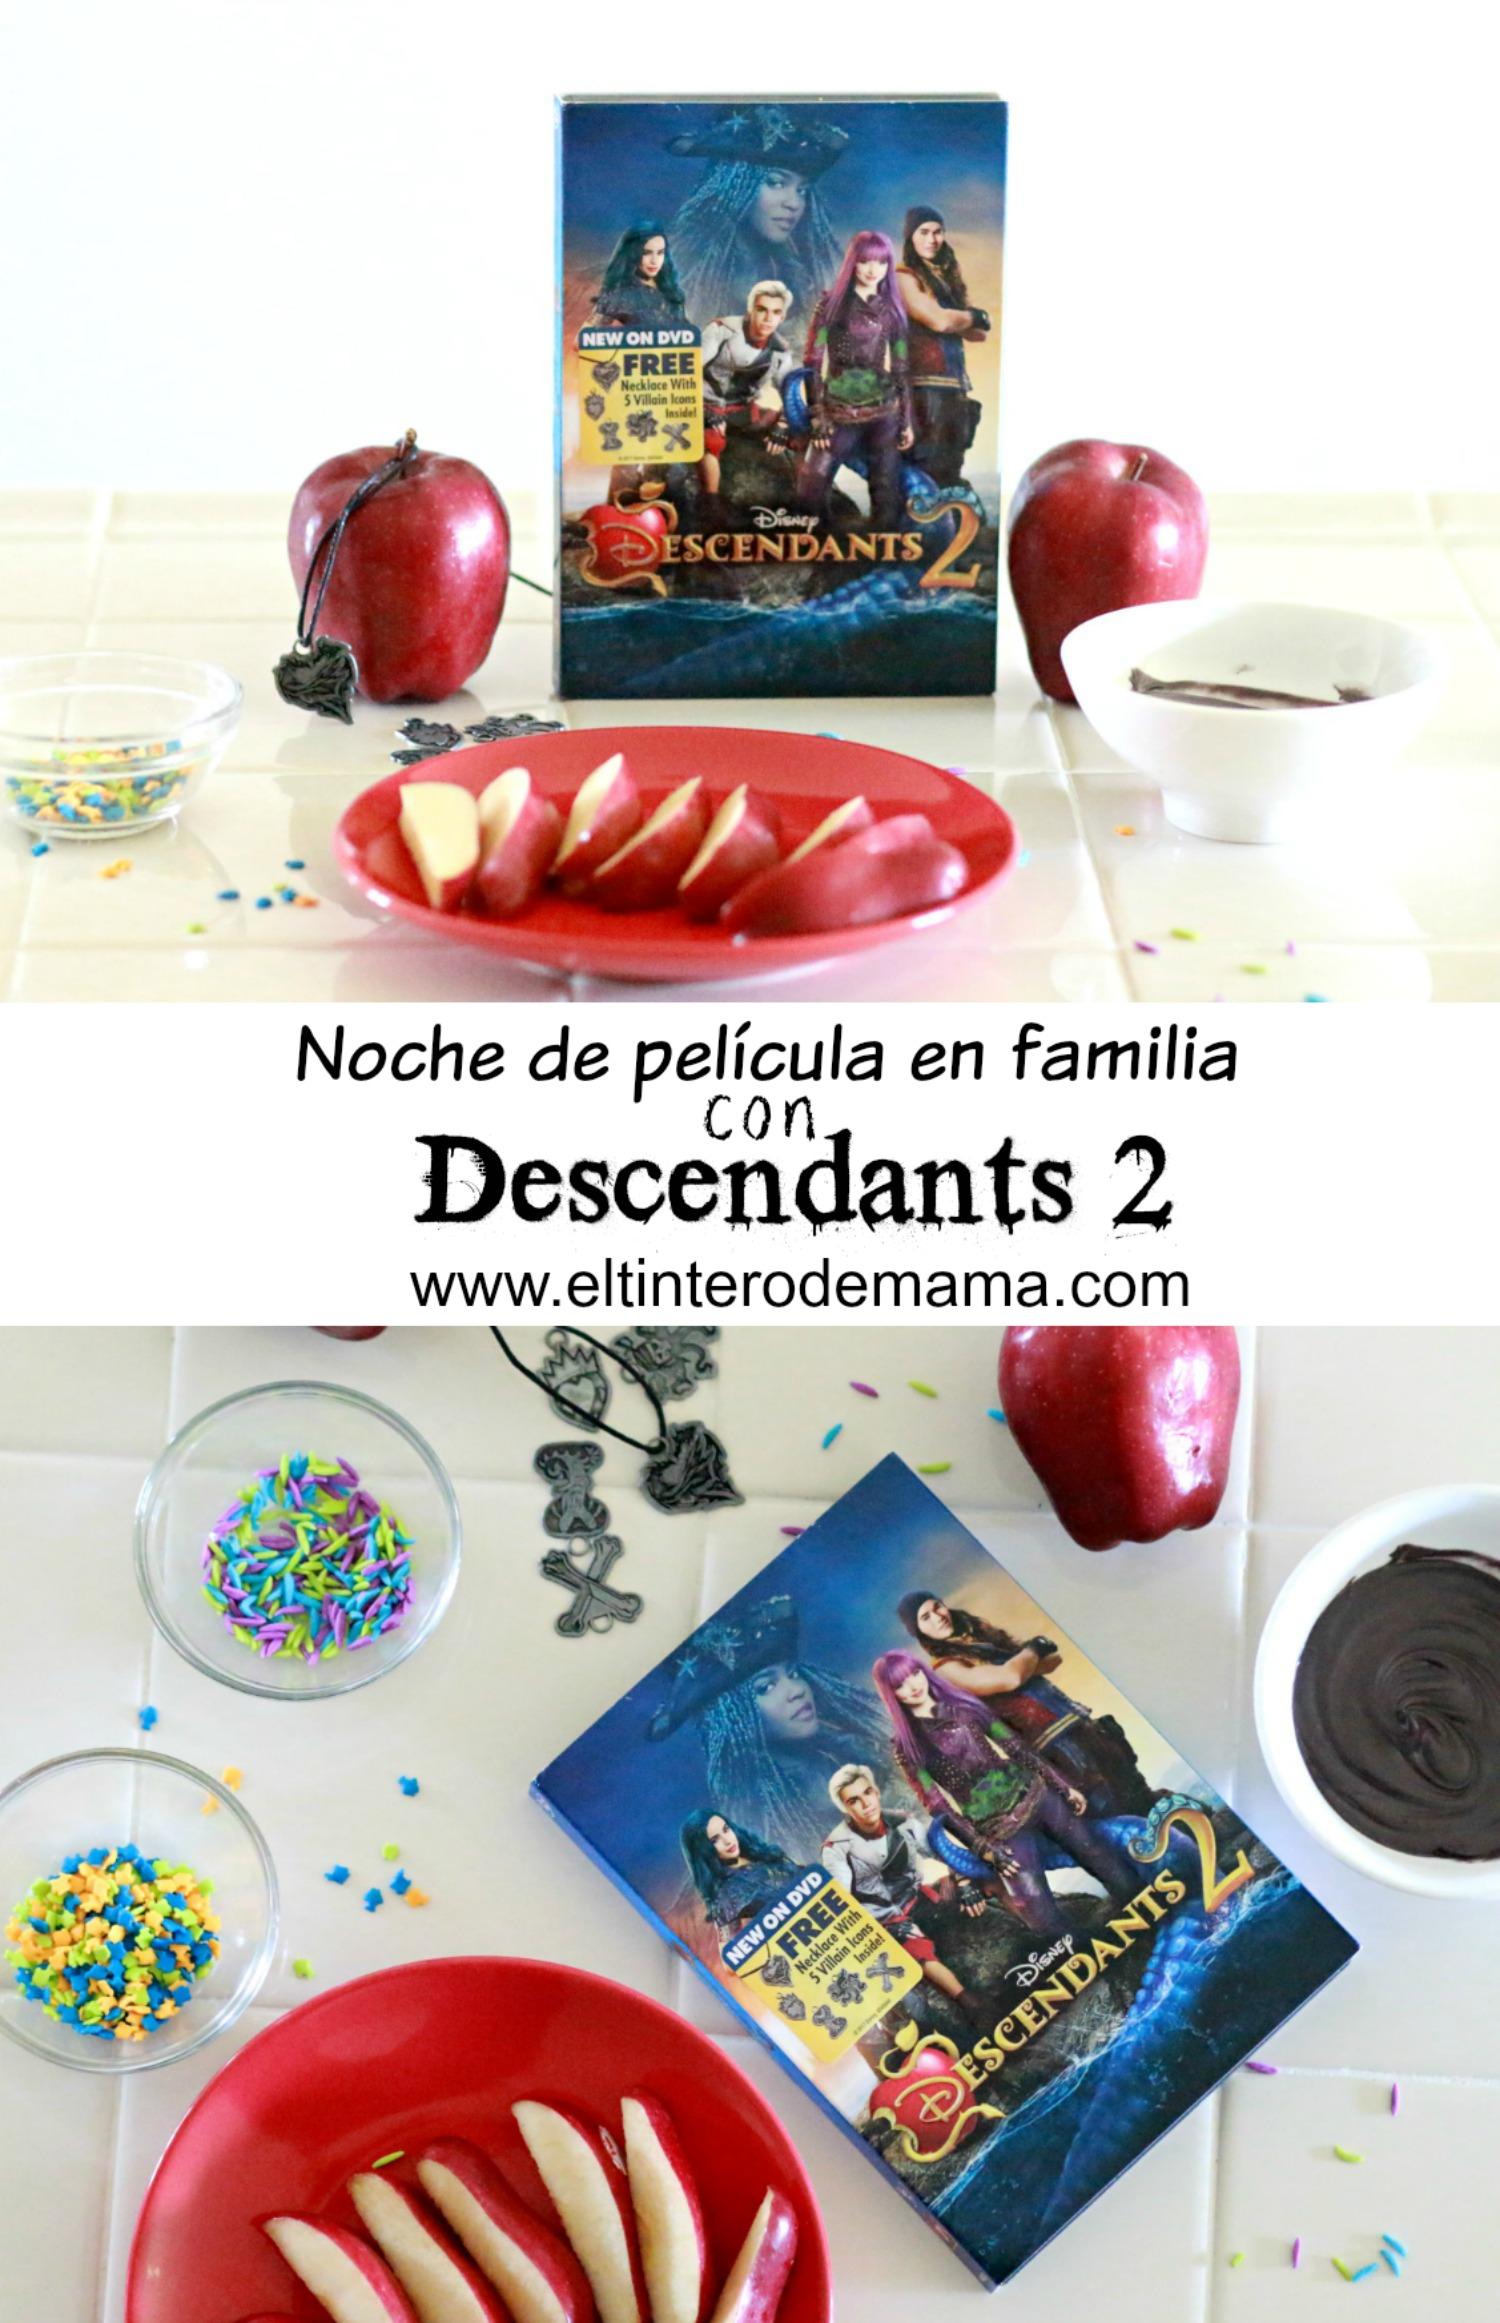 Descendants-2-noche-de-pelicula-en-familia